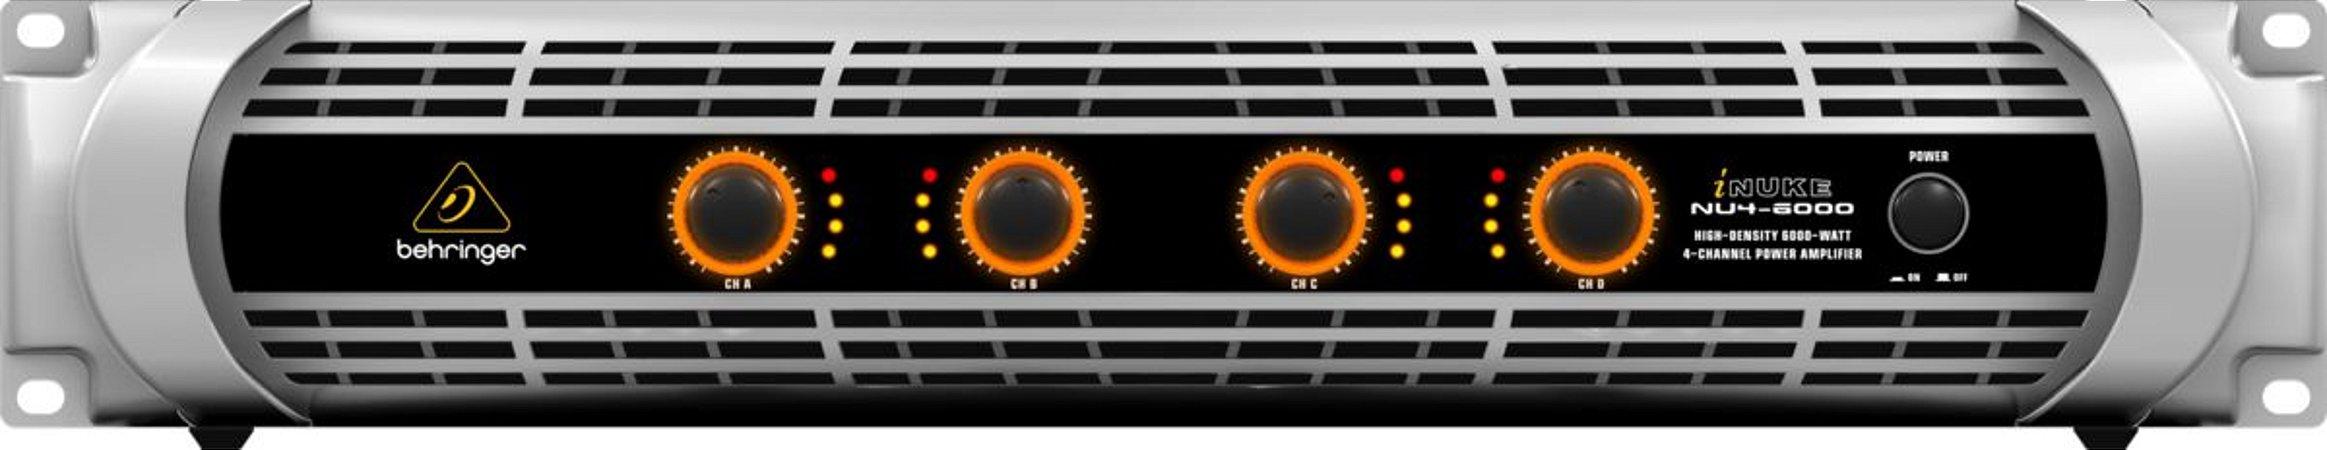 Amplificador de Potência Behringer  Inuke NU4-6000 6000W 110V